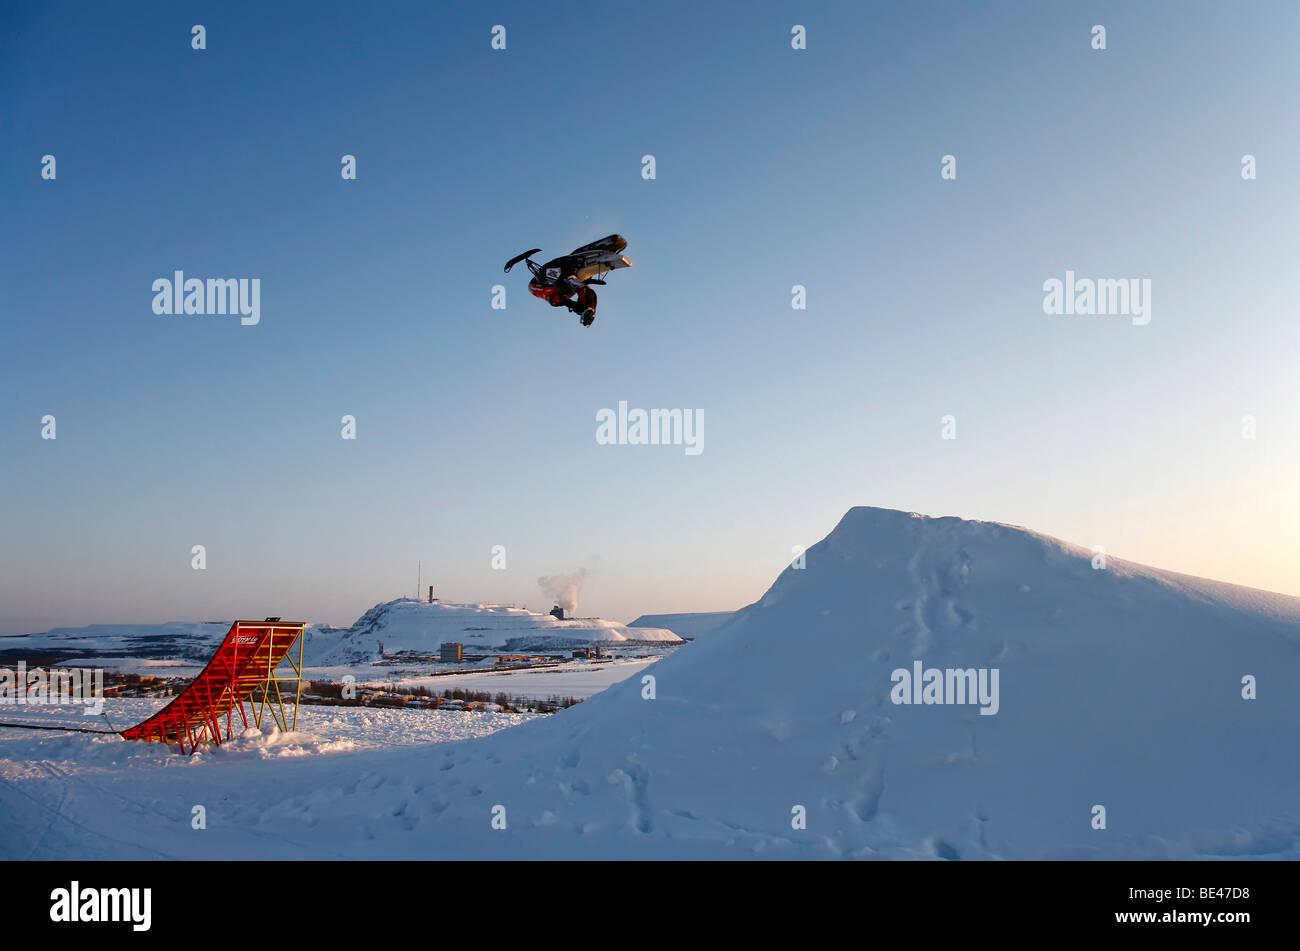 Somersaulting snowmobile in front of an ore mine in Kiruna, Sweden, Scandinavia, Europe Stock Photo